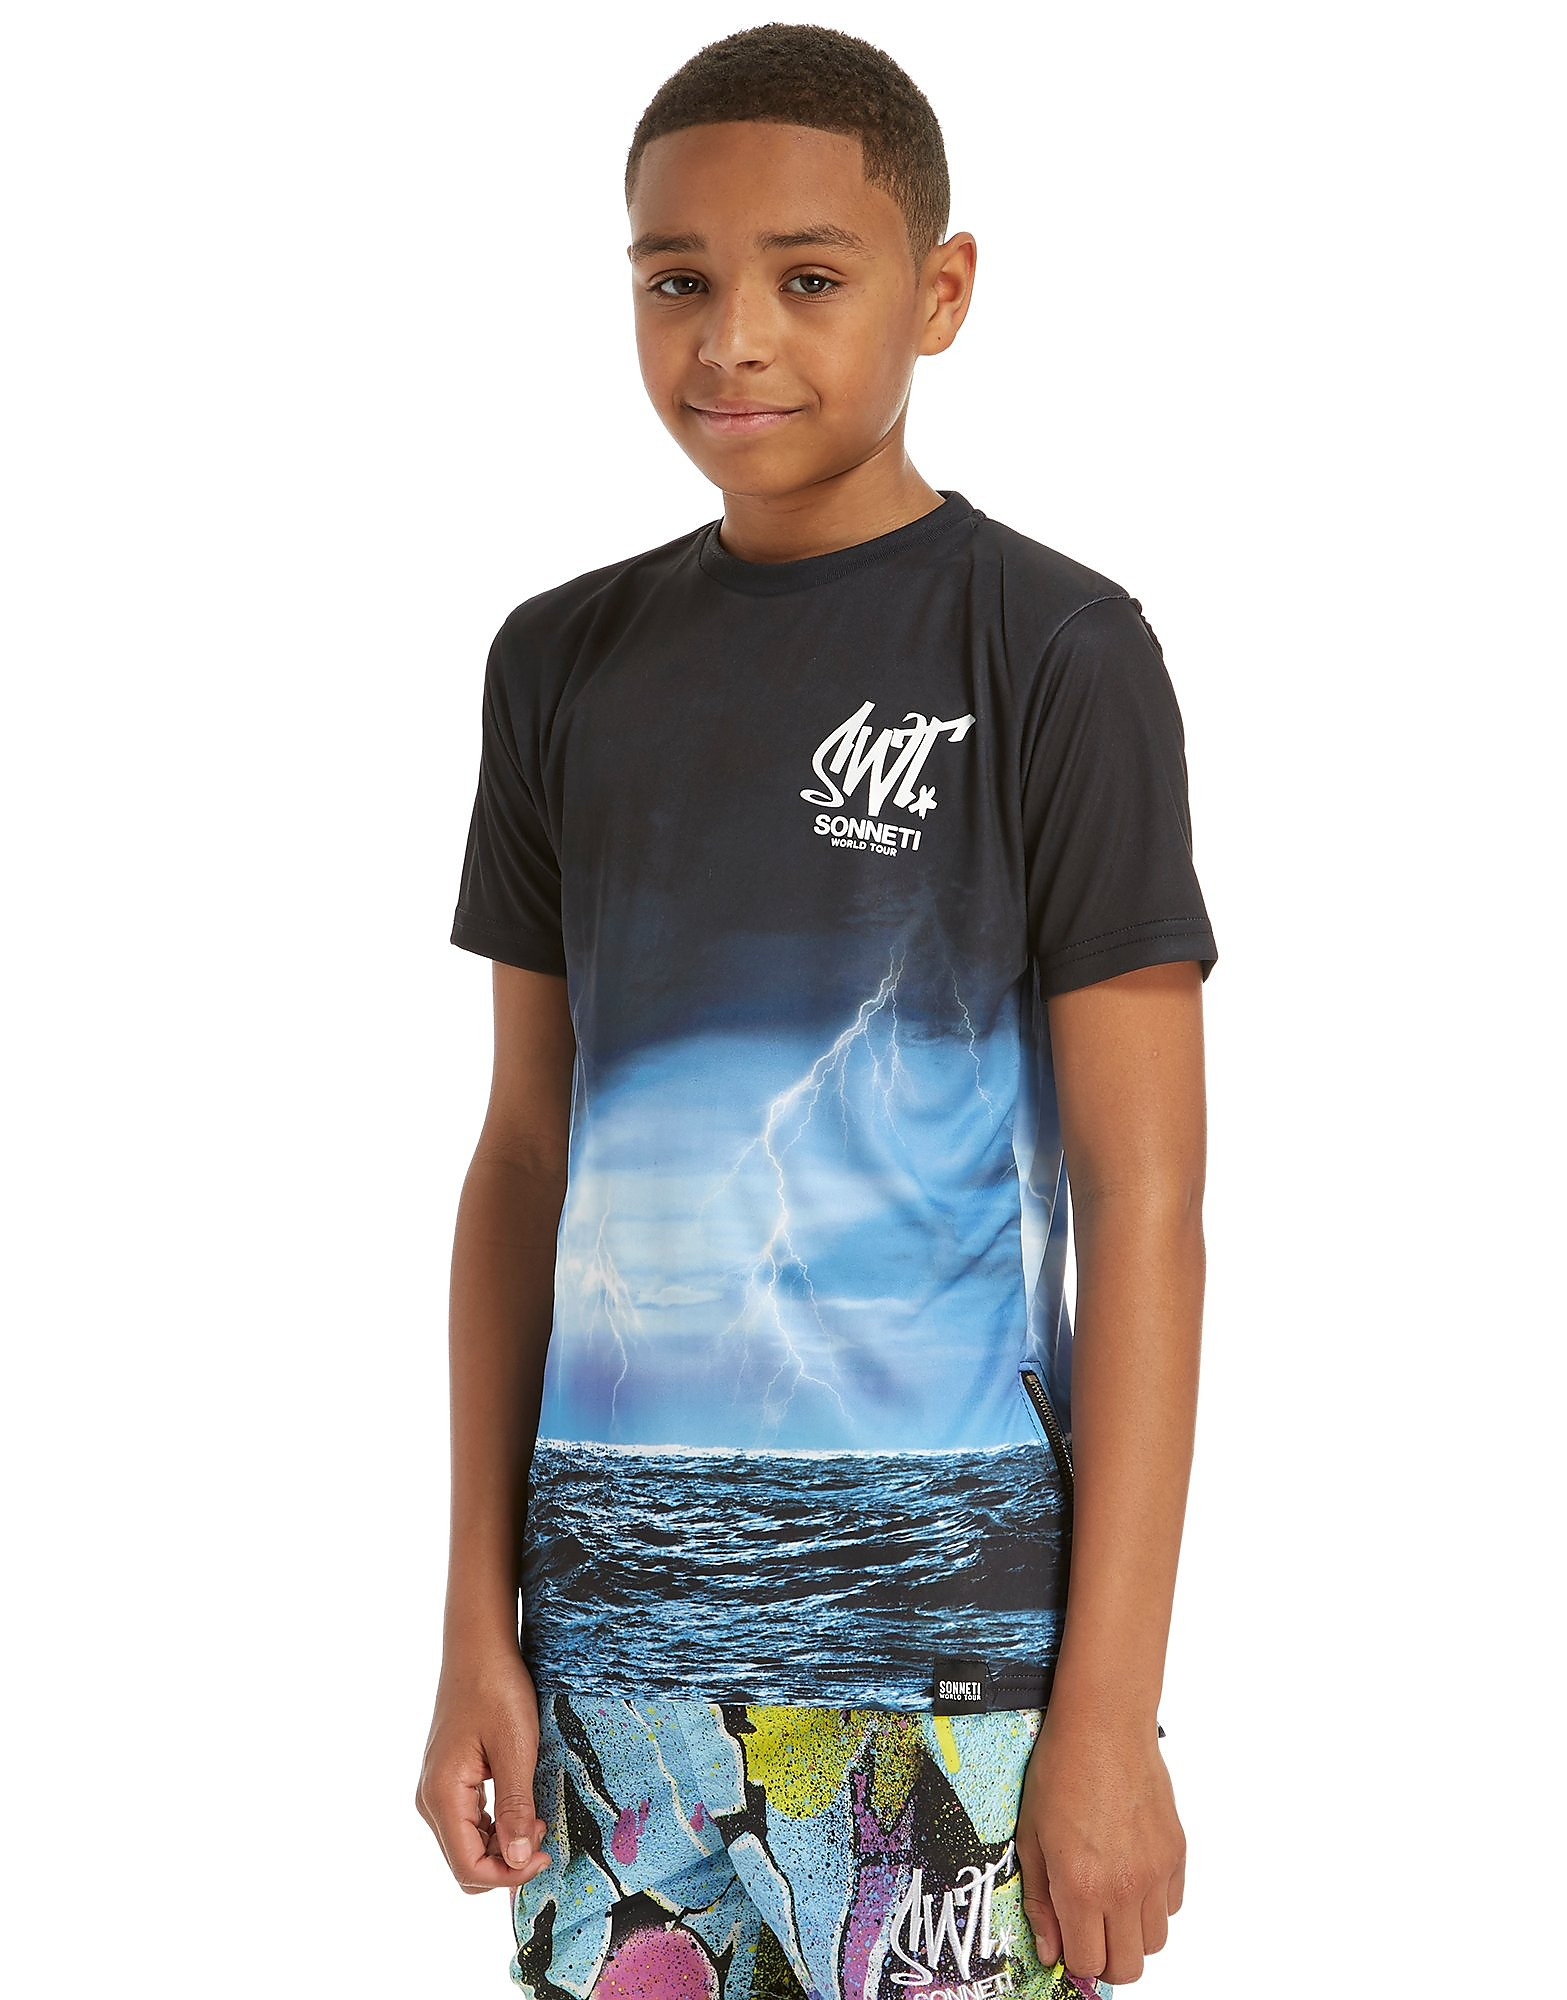 Sonneti camiseta Sea Storm júnior